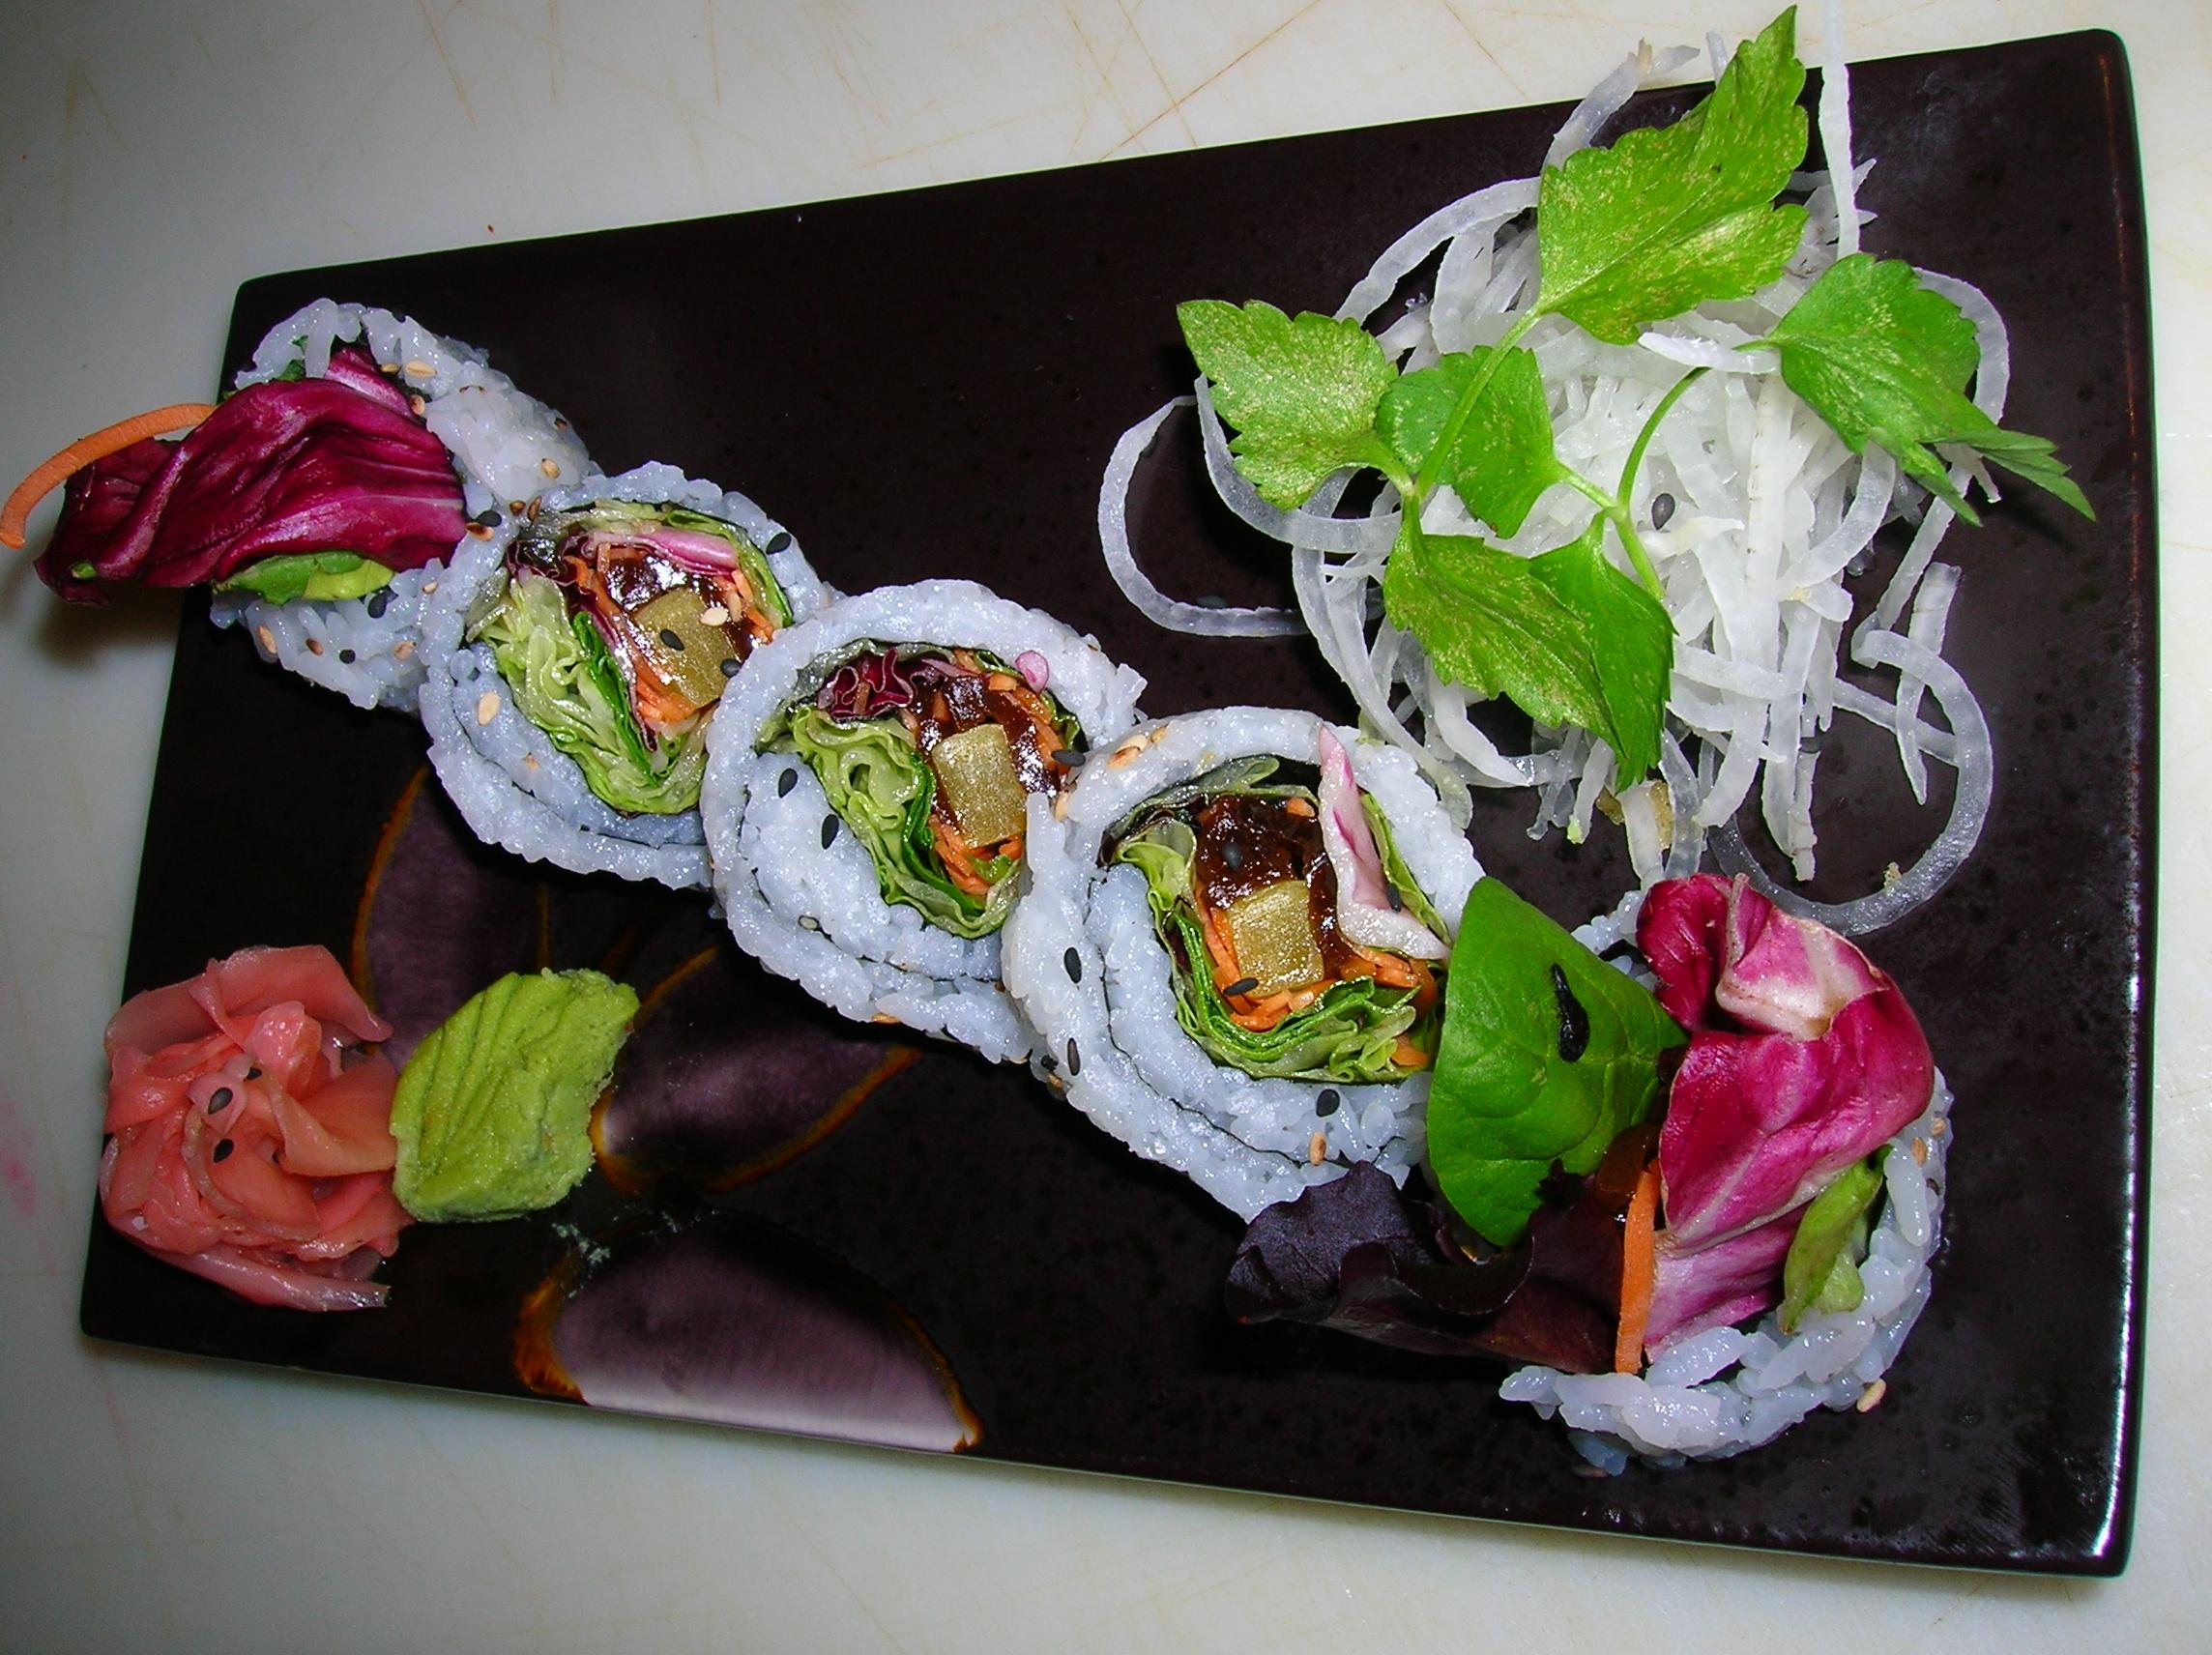 Vegetable Roll Image